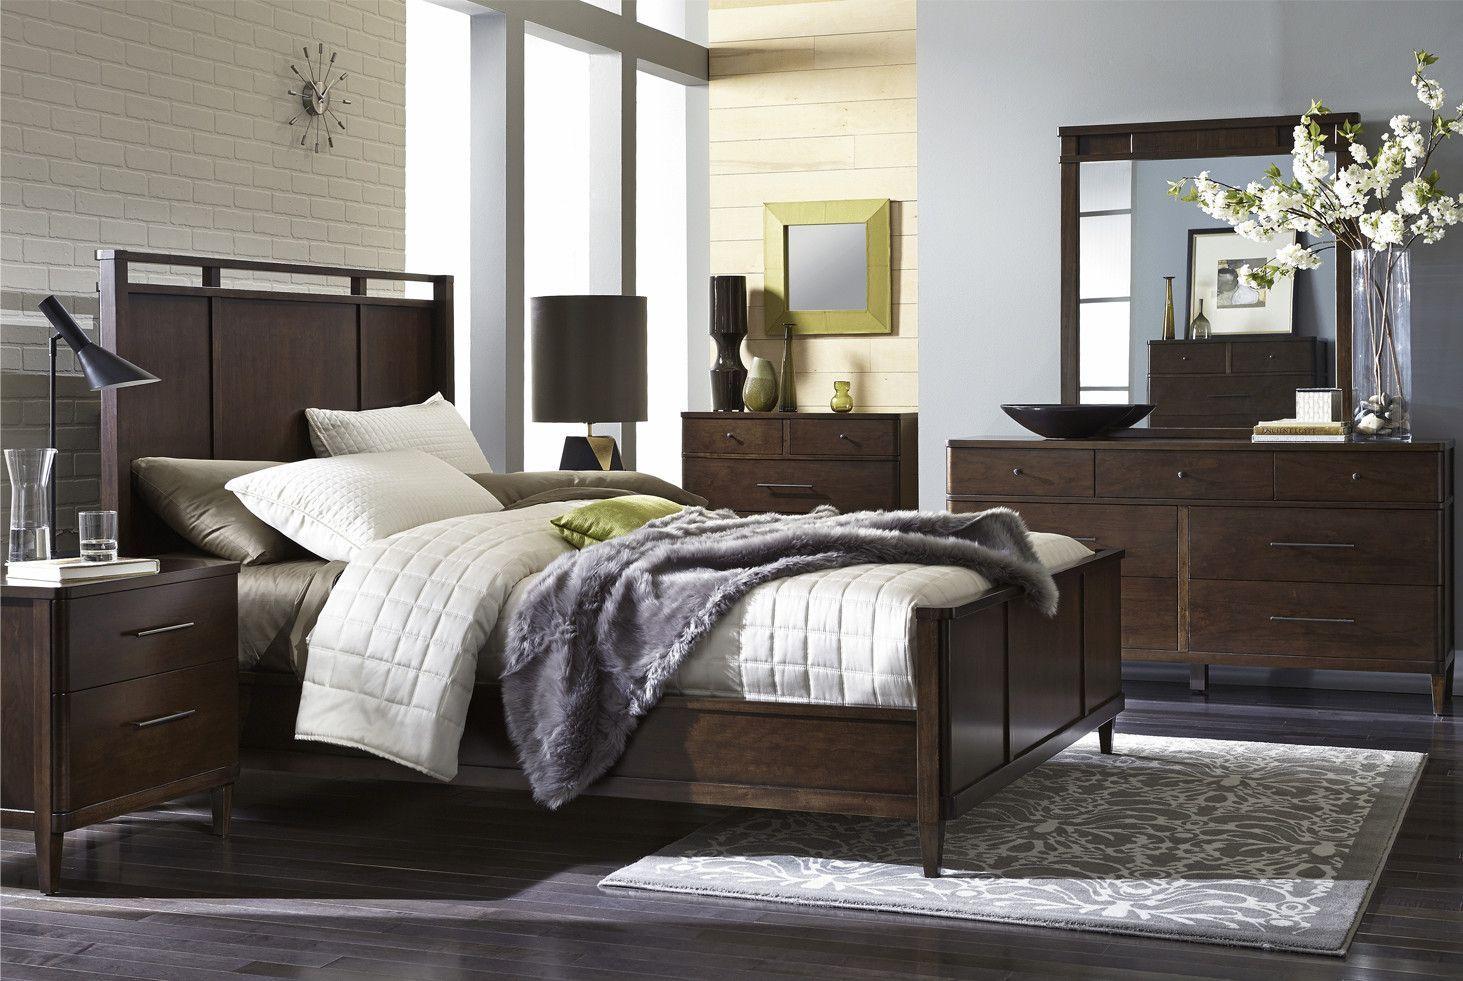 Pleasing Brisbane 6 Drawer Chest Products Bedroom Furniture Sets Interior Design Ideas Gentotryabchikinfo